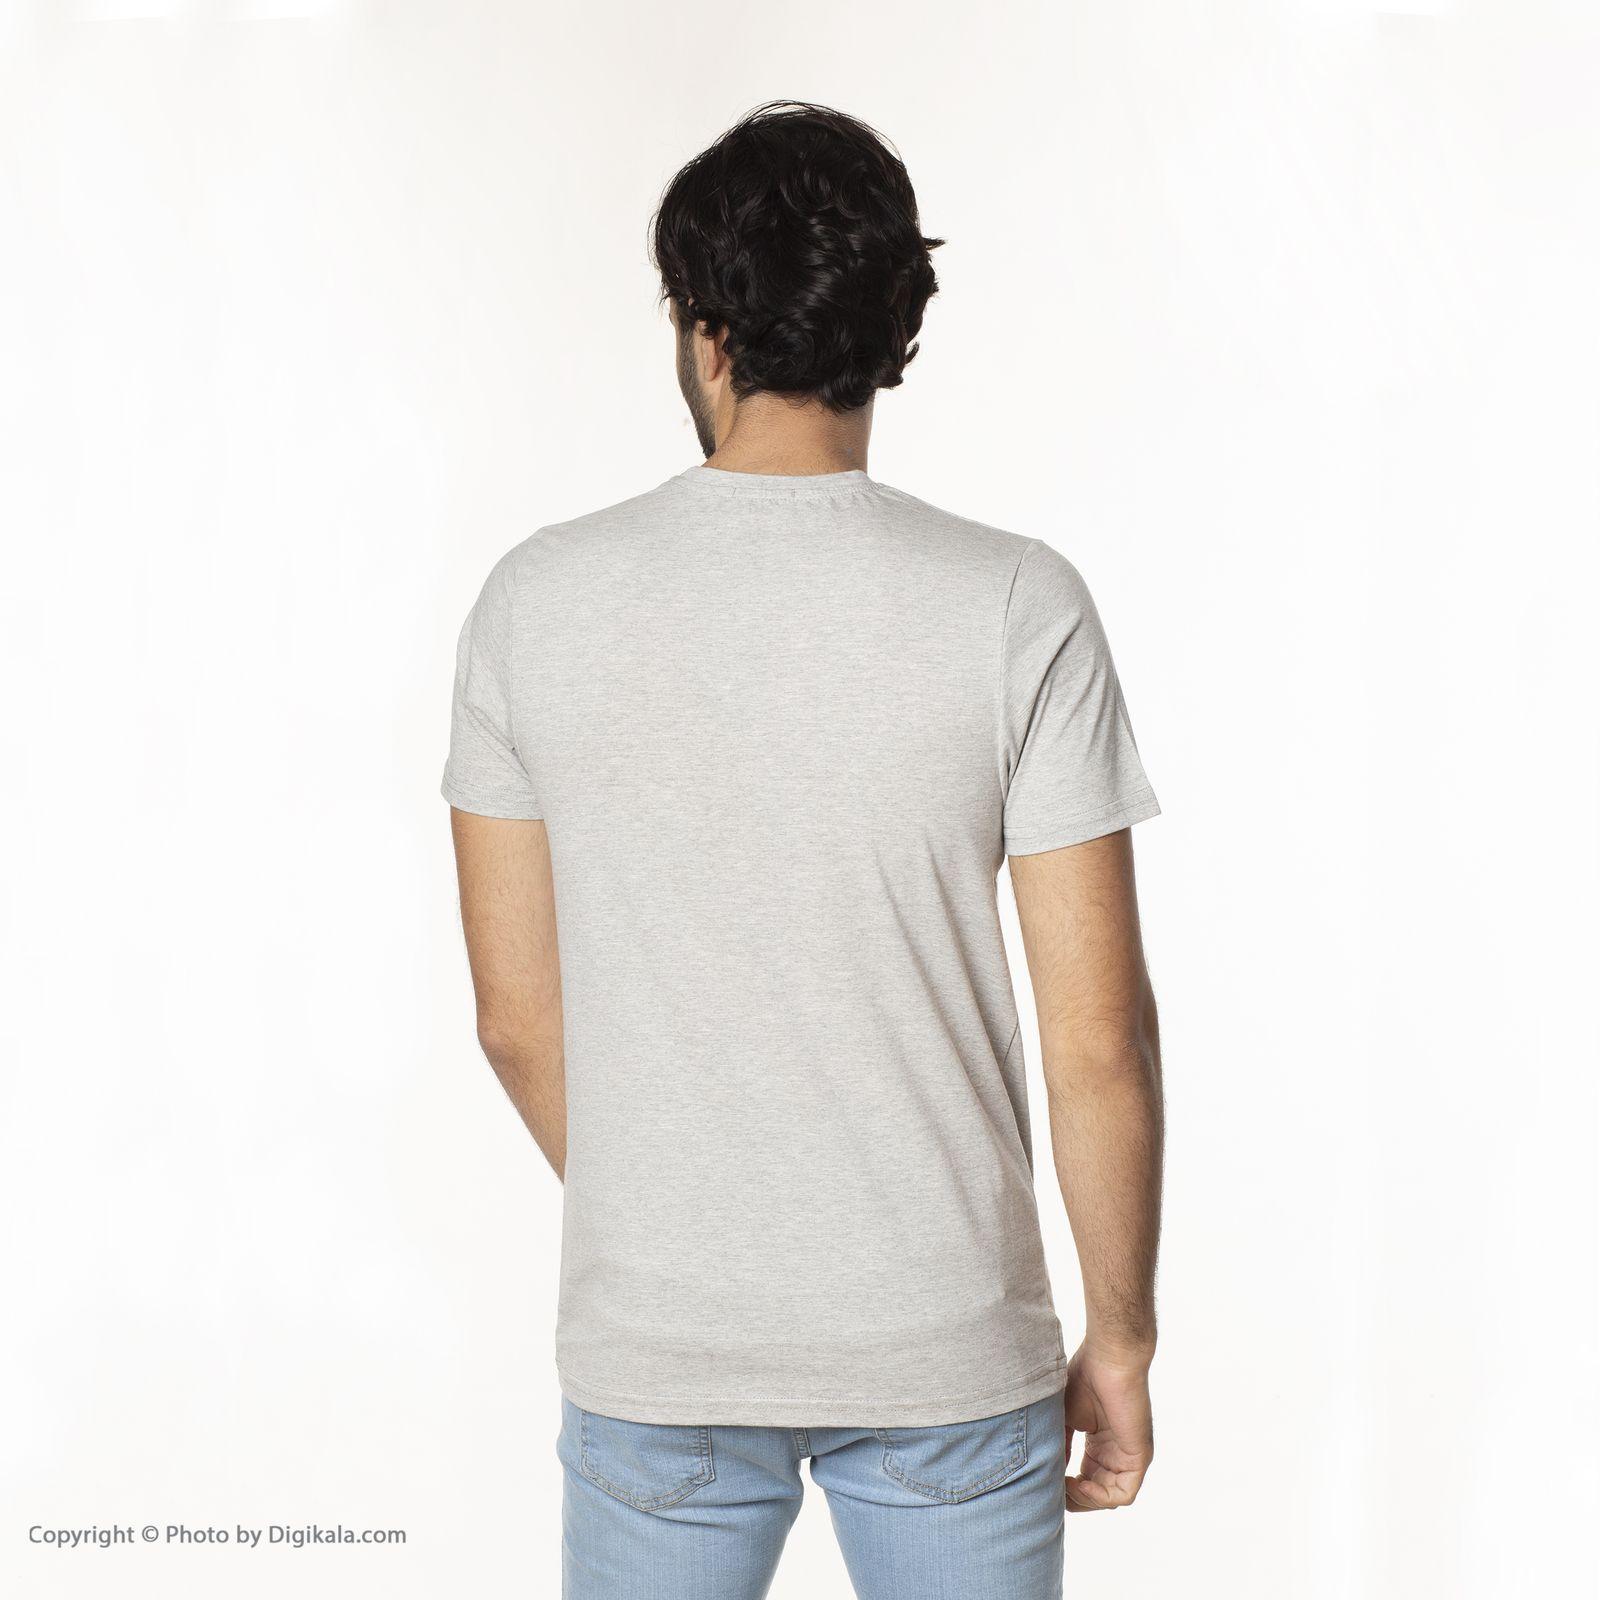 تیشرت مردانه آر اِن اِس مدل 12020956-93 -  - 11